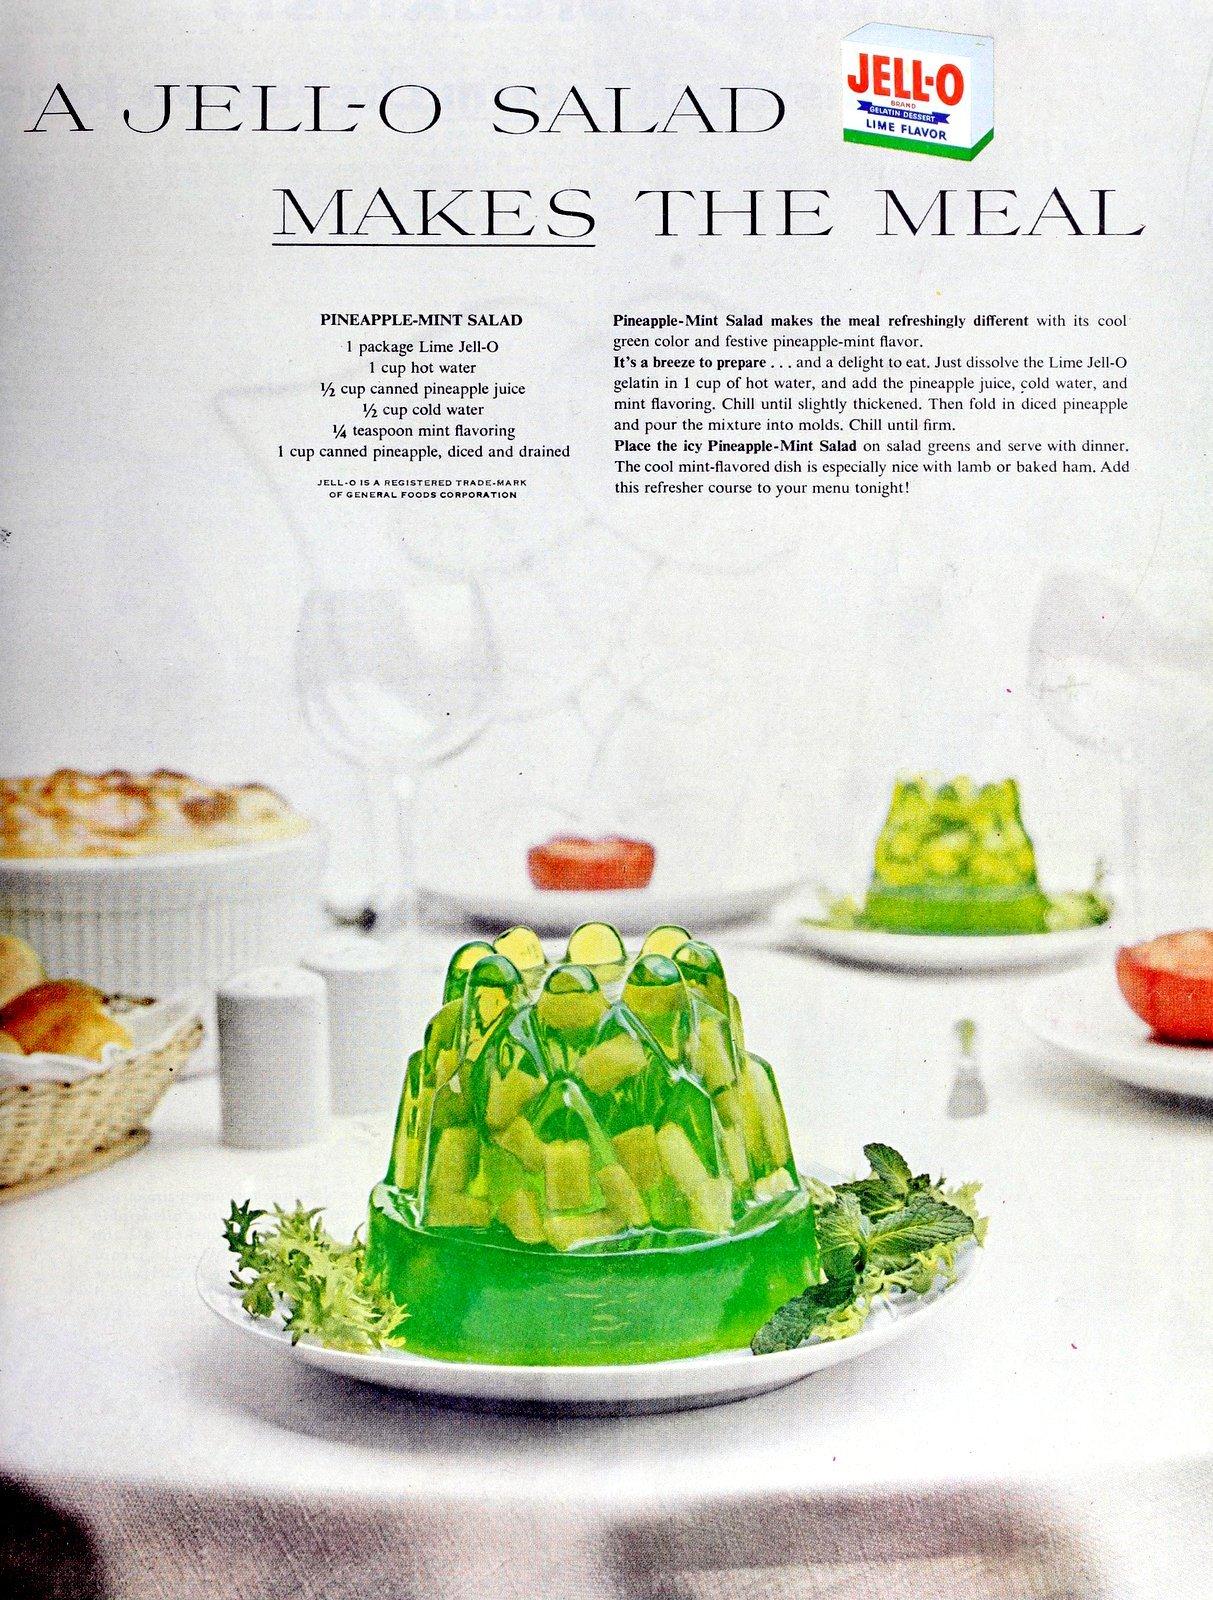 Pineapple-mint Jello salad mold recipe (1956)